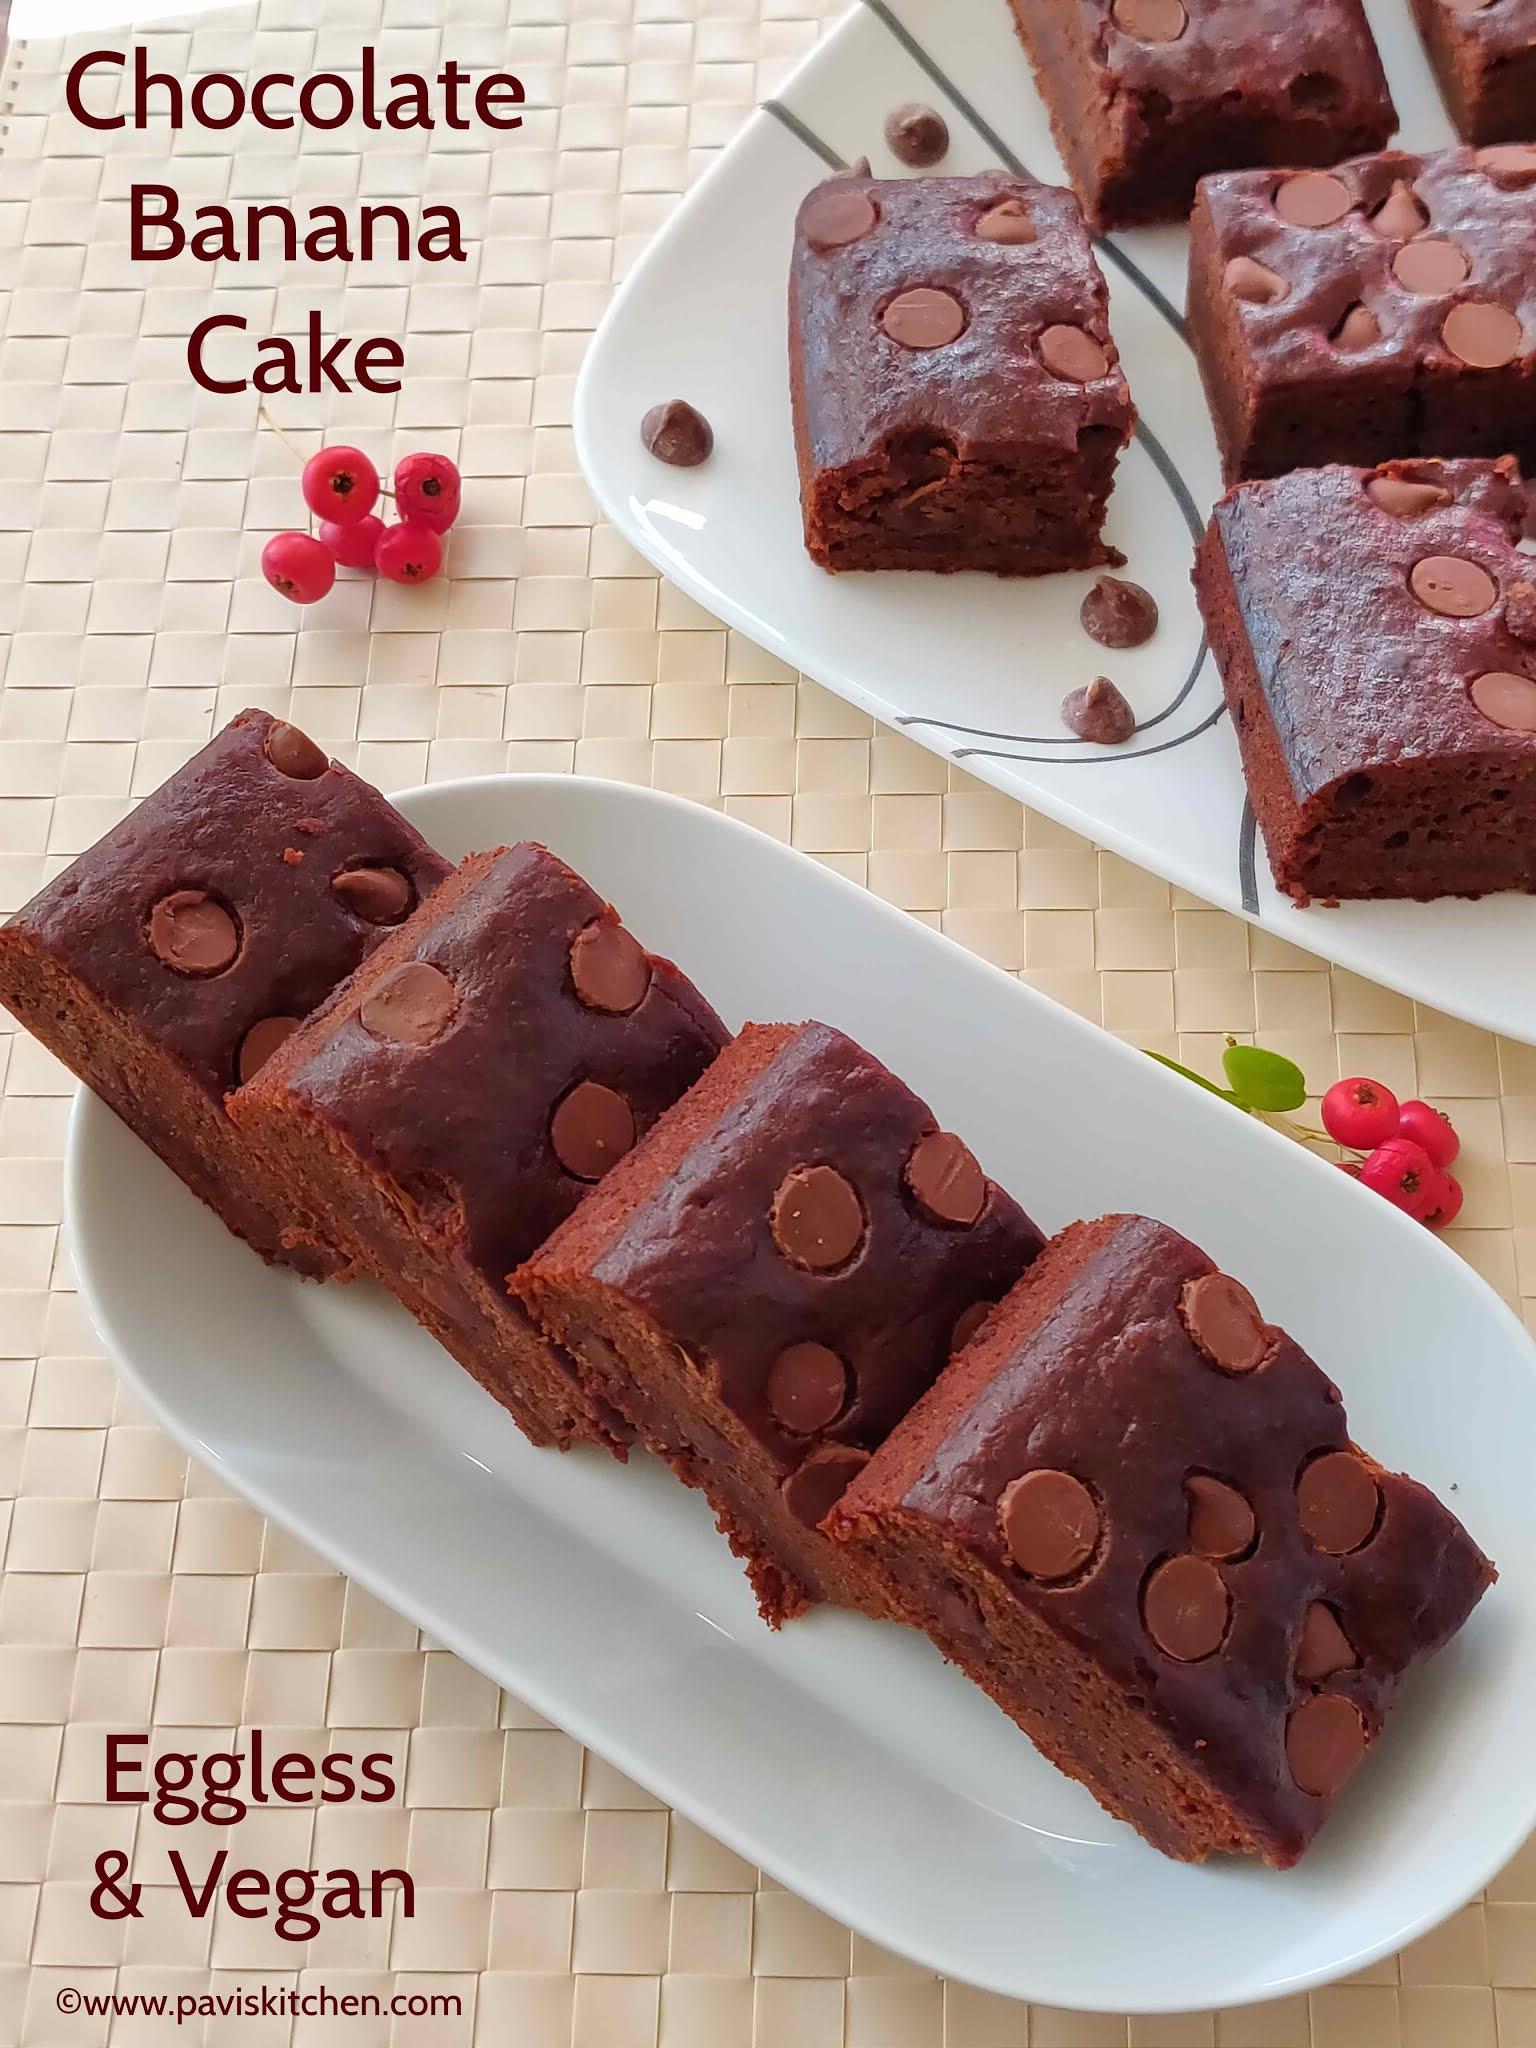 Eggless chocolate banana cake recipe | Vegan banana chocolate chip cake recipe